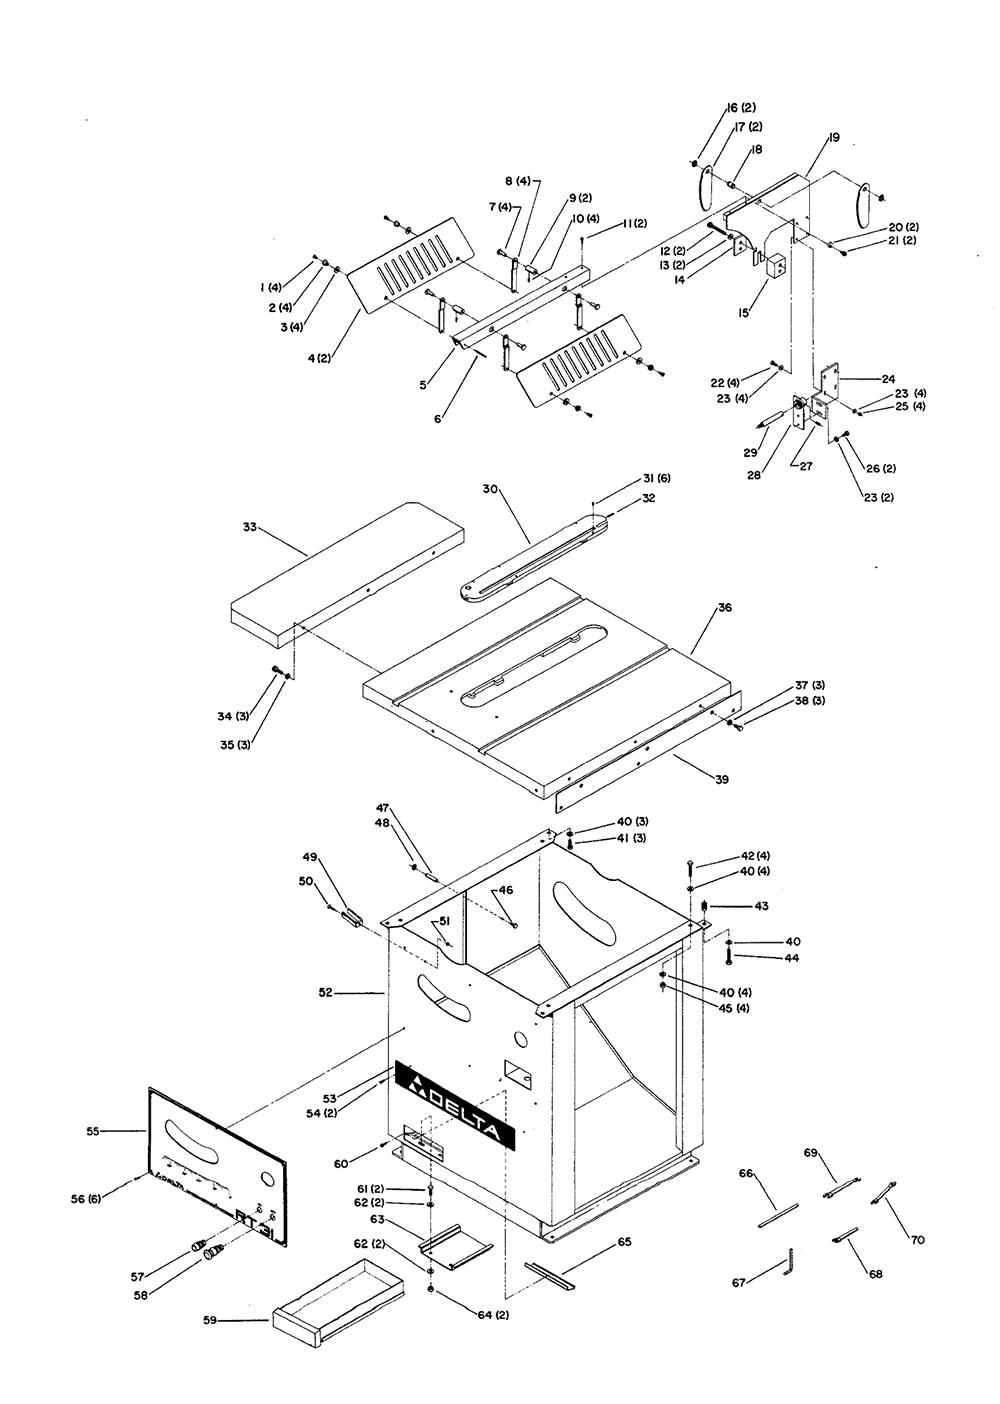 Delta Parts List Faucet 58065 And Diagram Ereplacementpartscom Repair Oem With 1000x1404